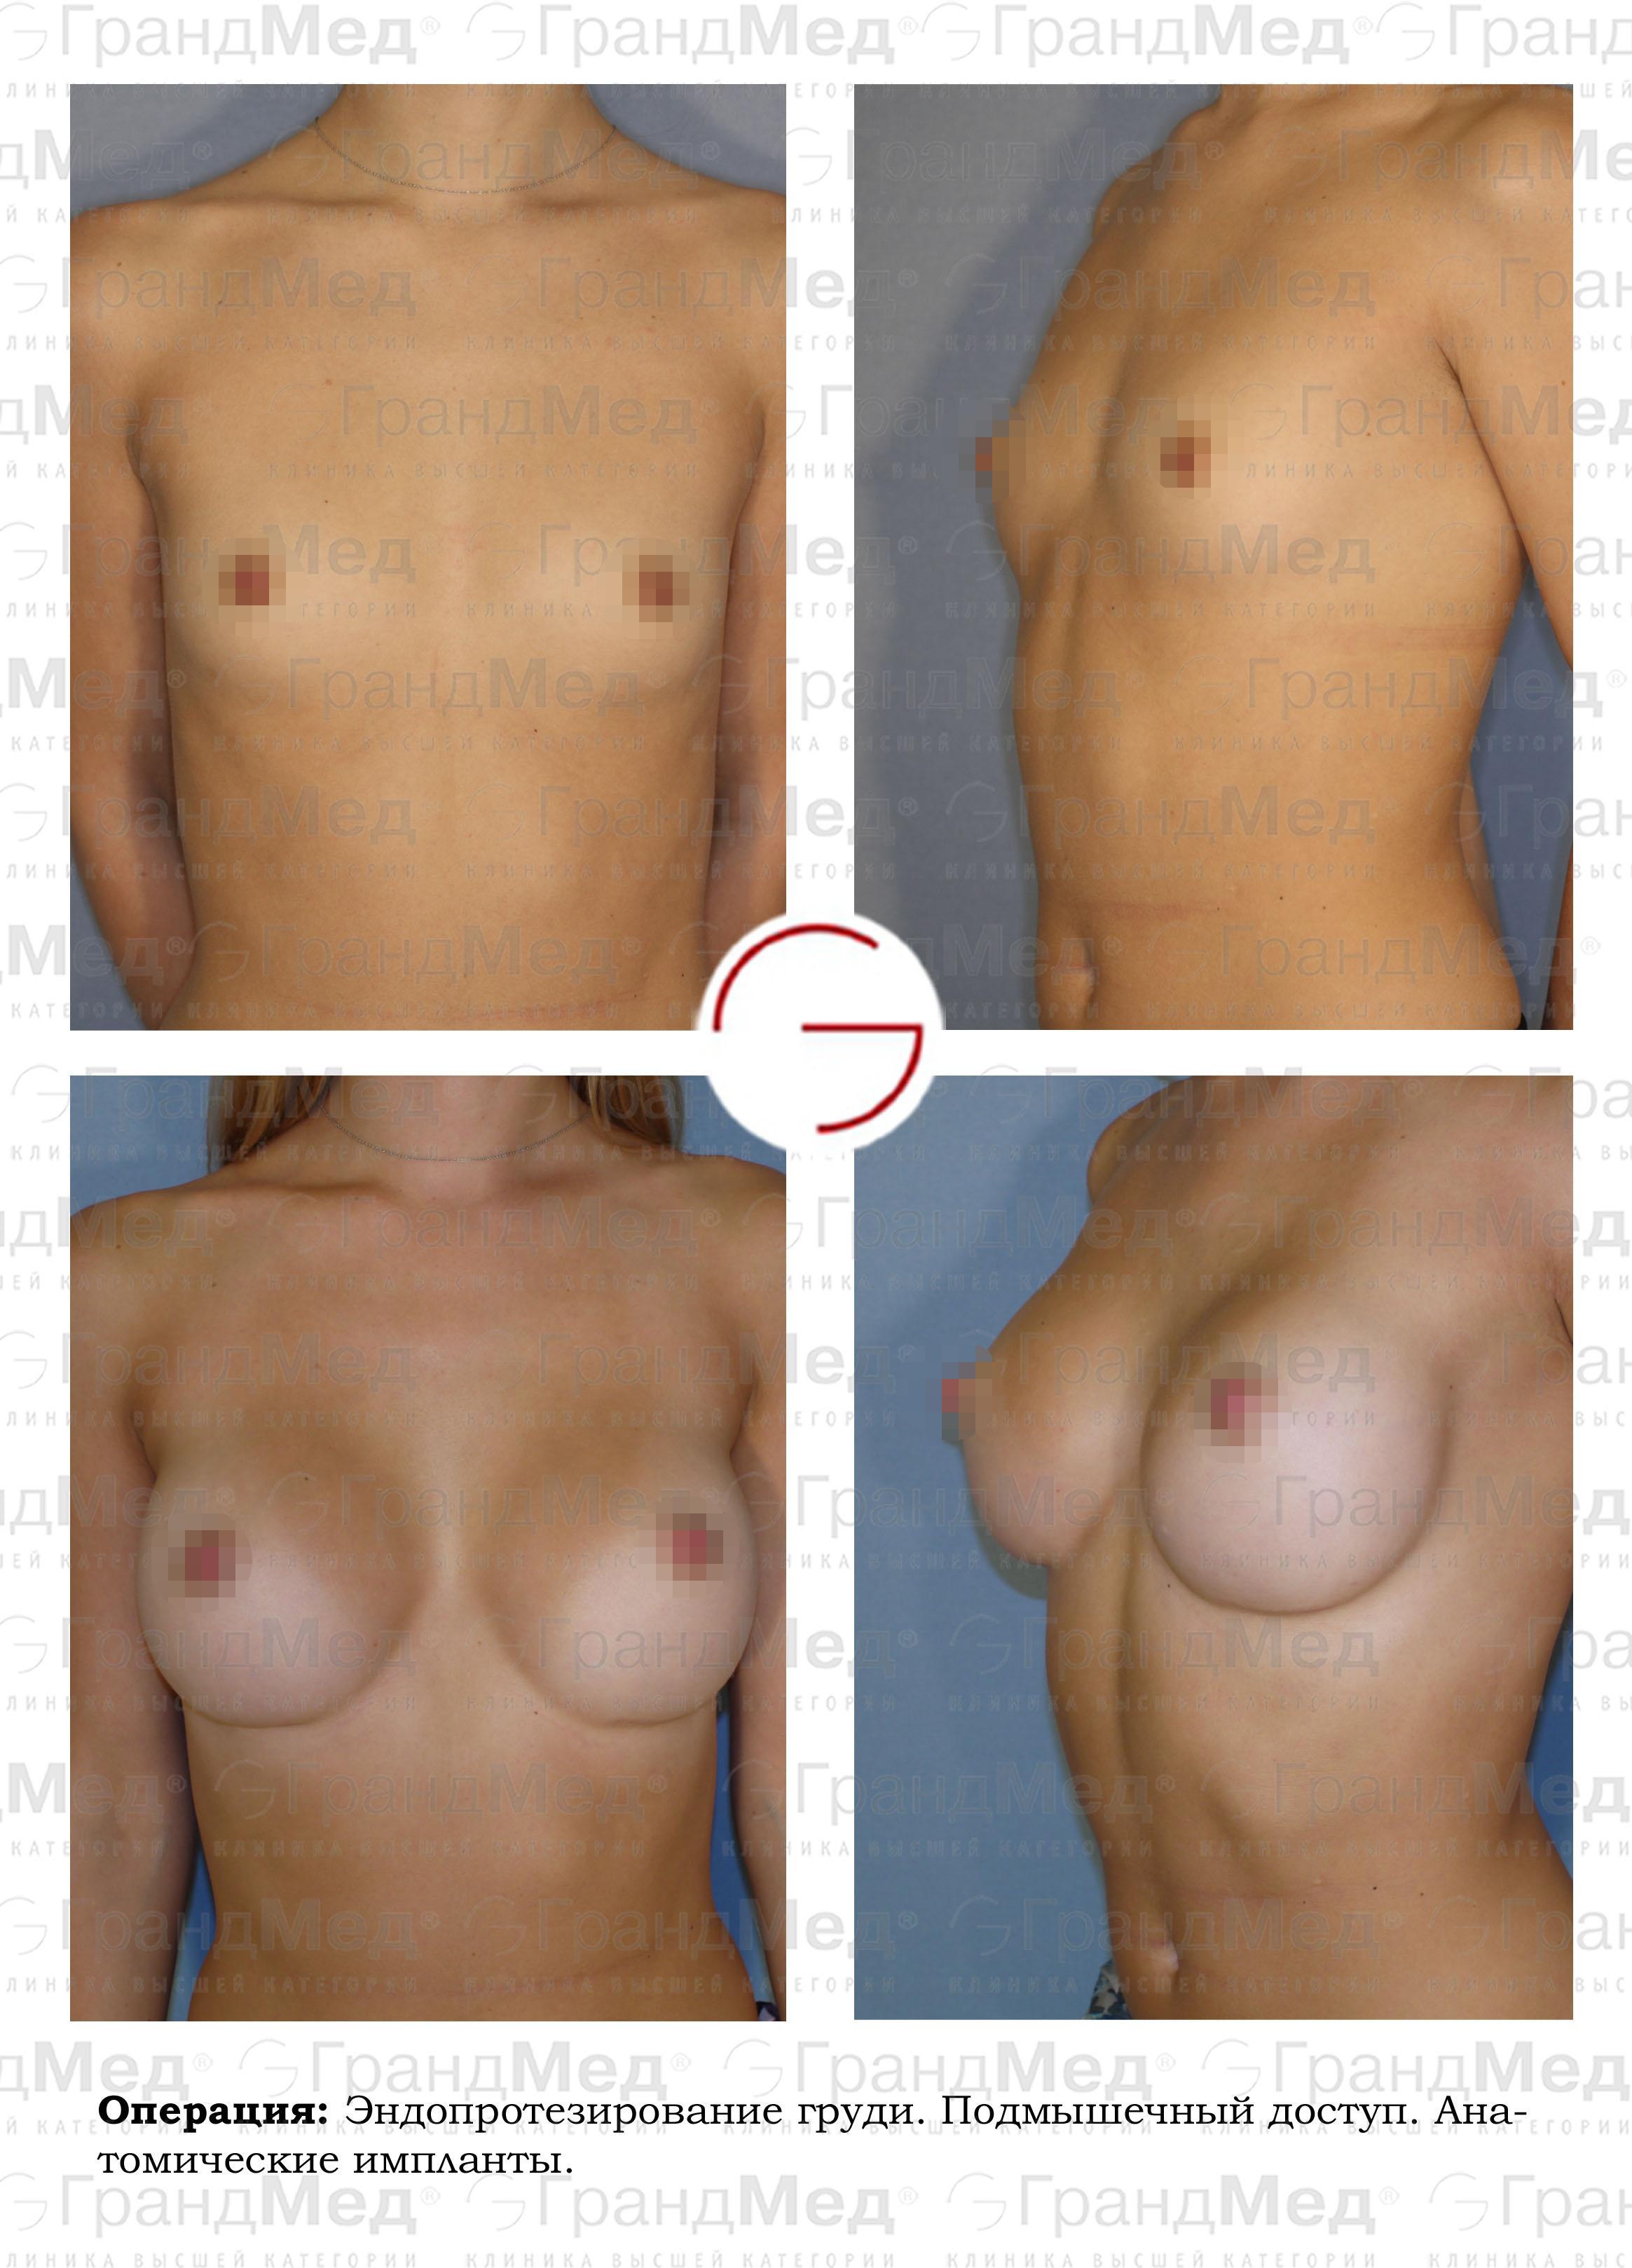 Голая маленькая острая грудь